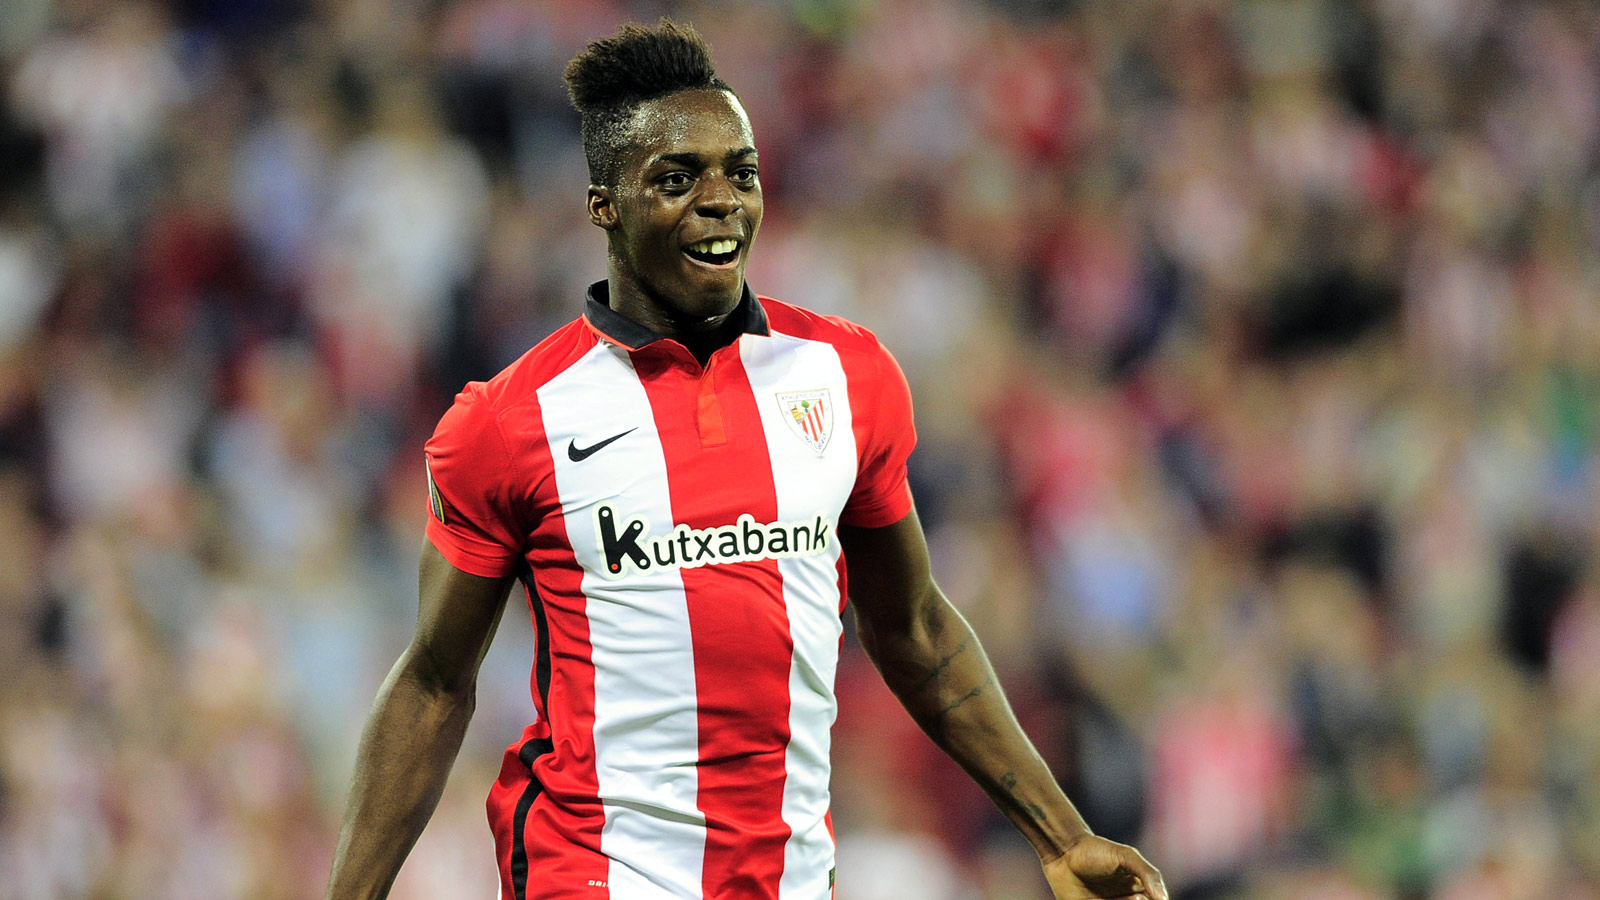 Superb Williams goal guides Athletic Bilbao past Espanyol